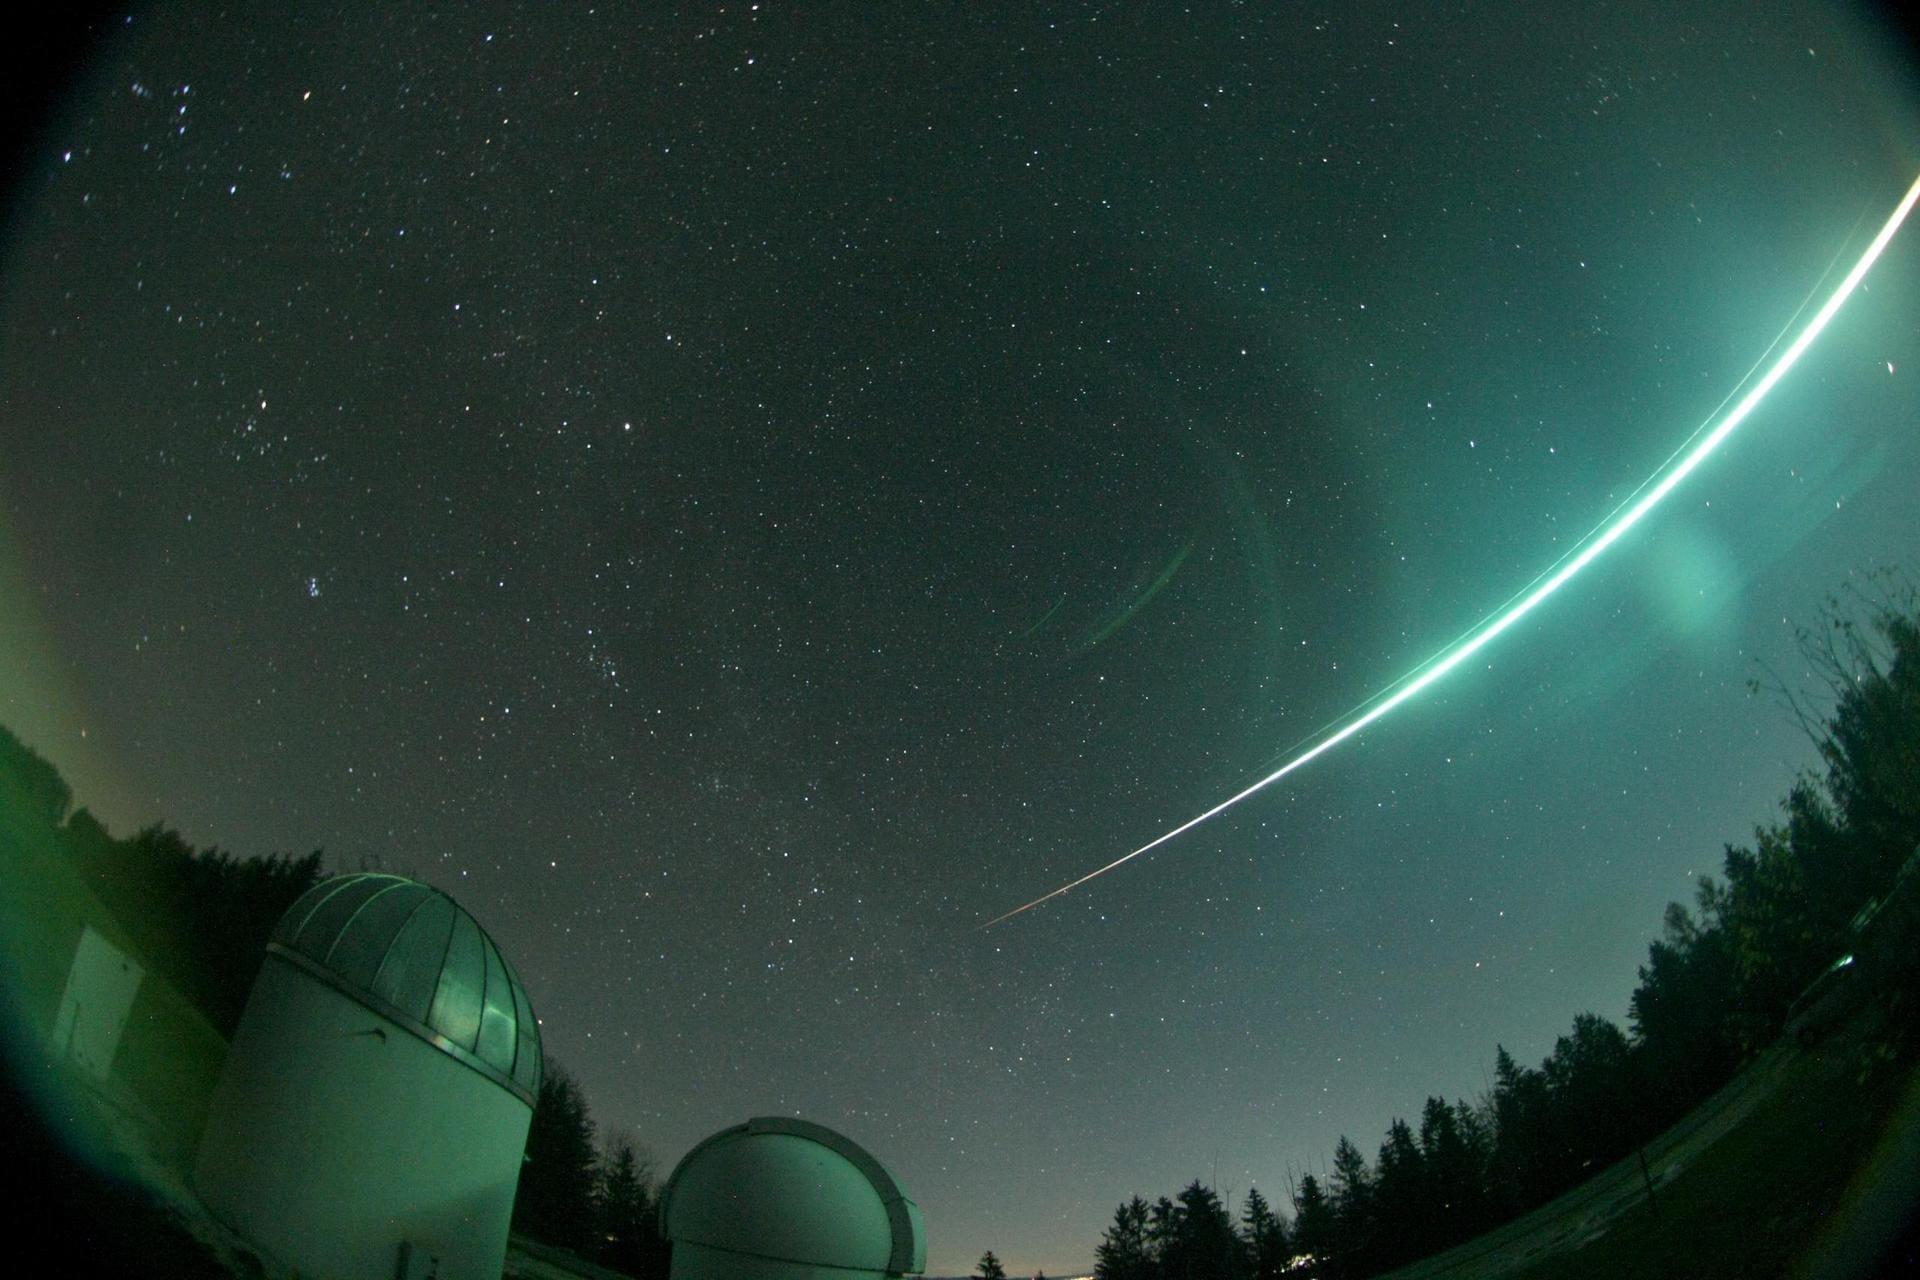 Phänomen am Nachthimmel Besonders heller Meteorit